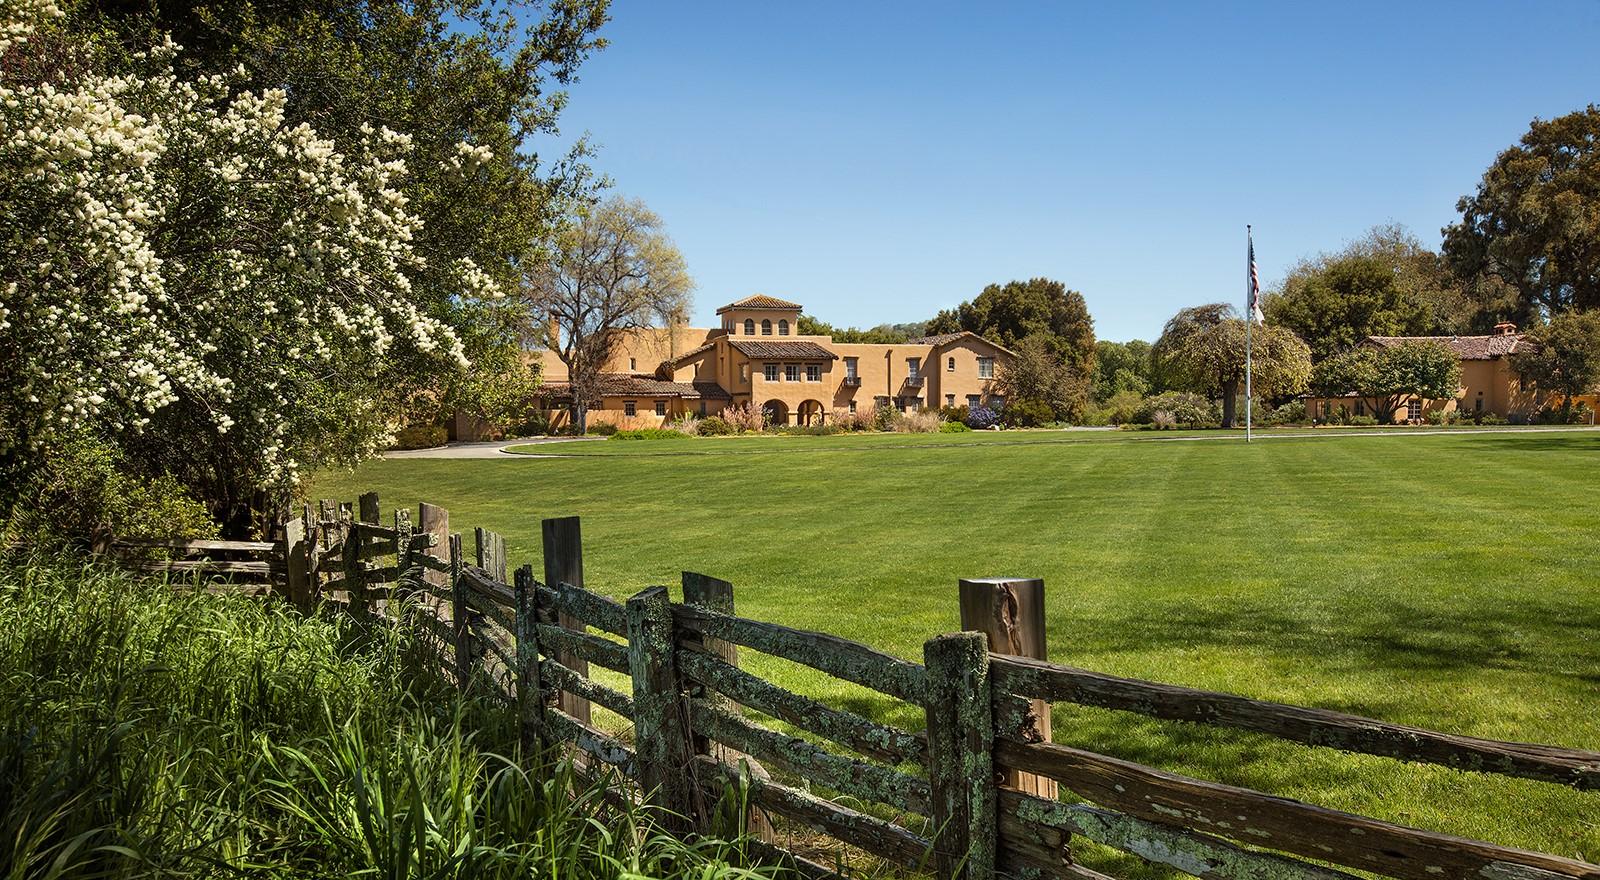 The Santa Luca preserve, Carmel, California - Sheet2